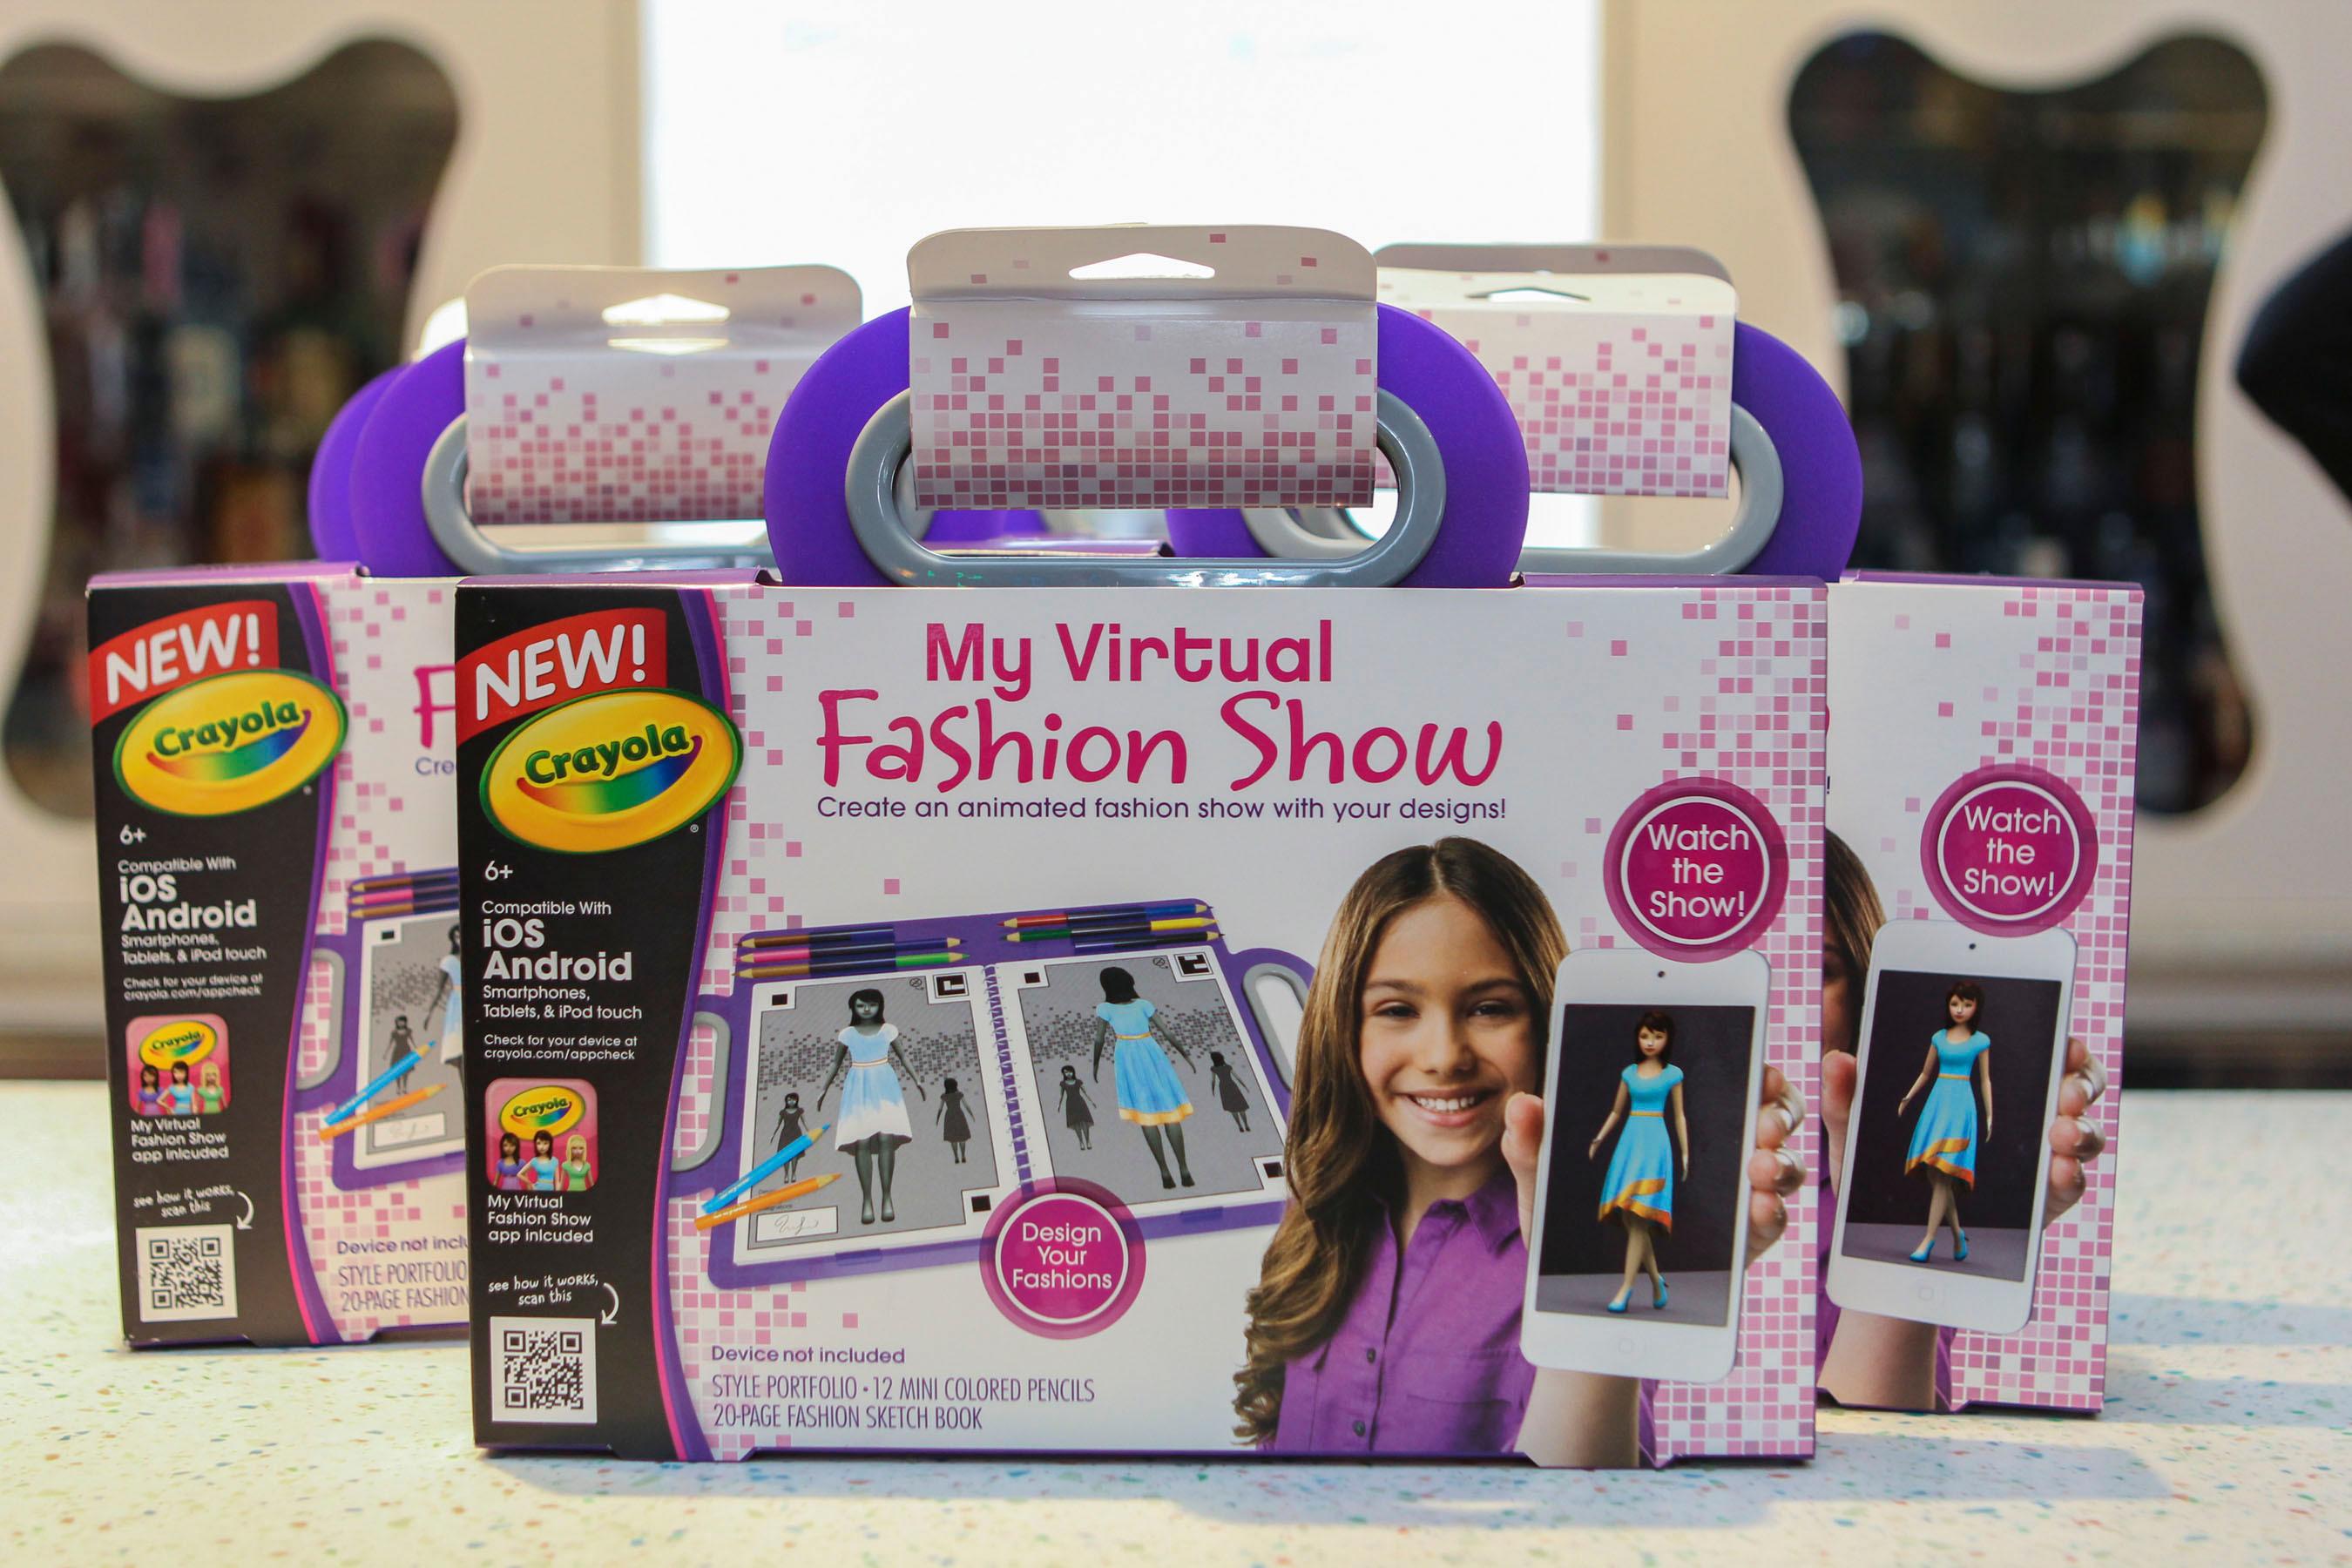 Crayola Fashion Show 2013 Crayola Launches My Virtual